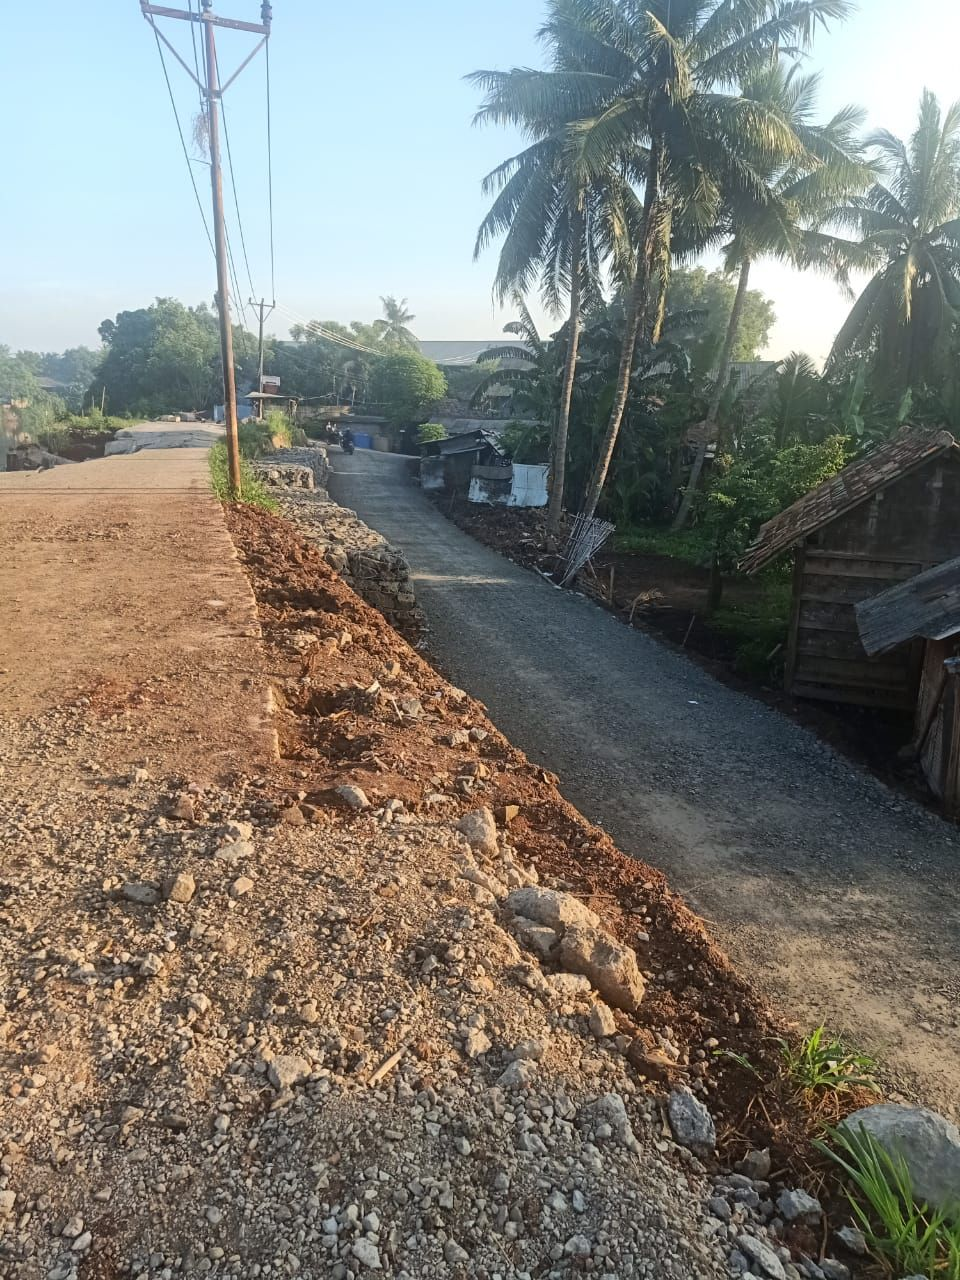 Jalan alternatif yang dibangun Pemkab di dekat Jl Tanjung Burung Teluknaga yang longsor. (Dok Dinas Bina Marga SDA Kab Tangerang)